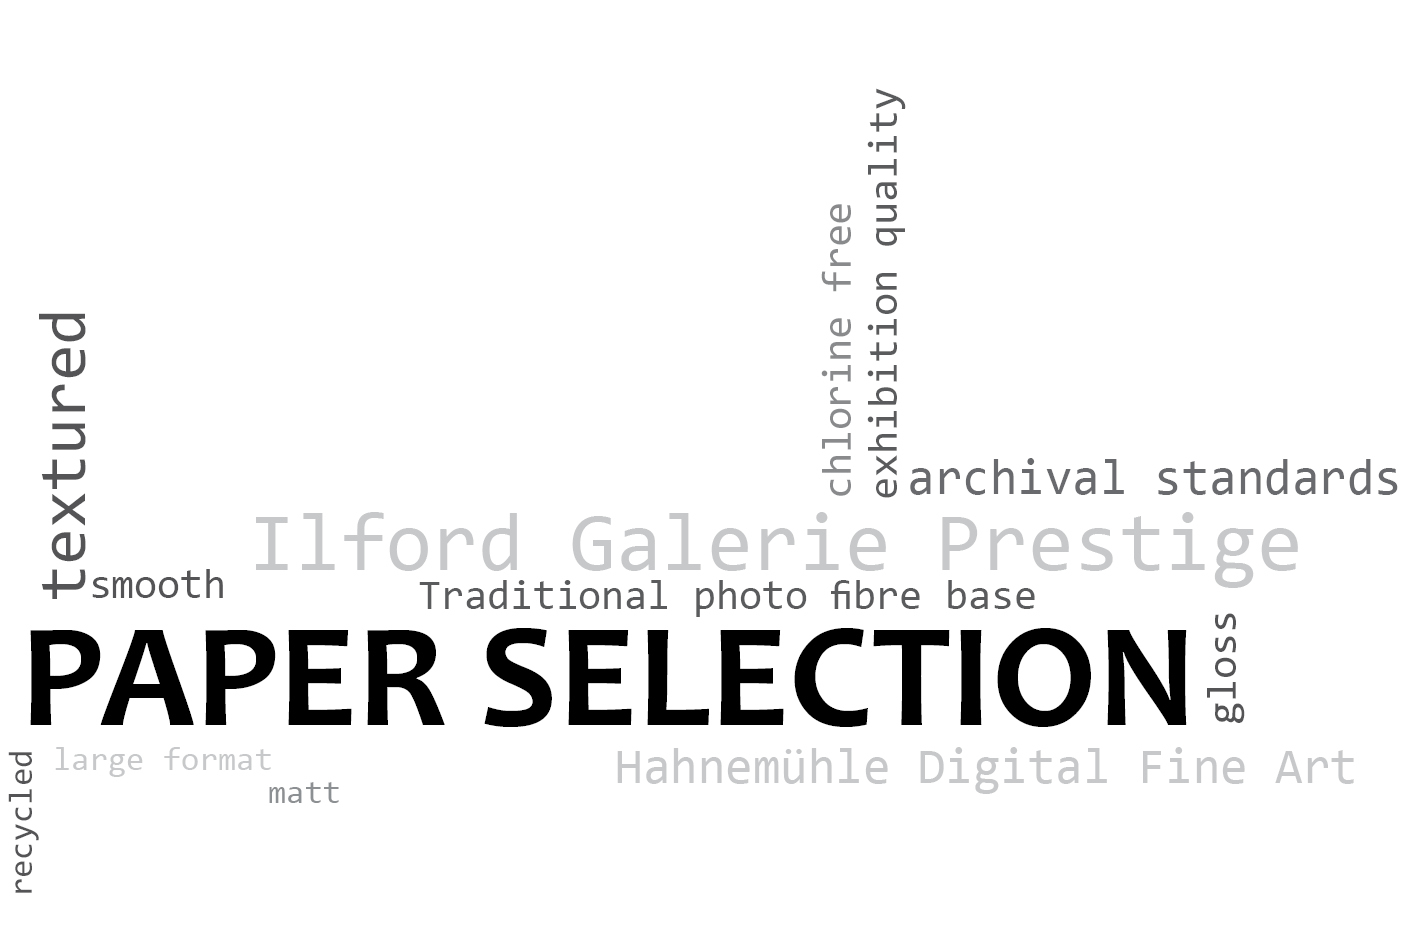 paper-selection.jpg